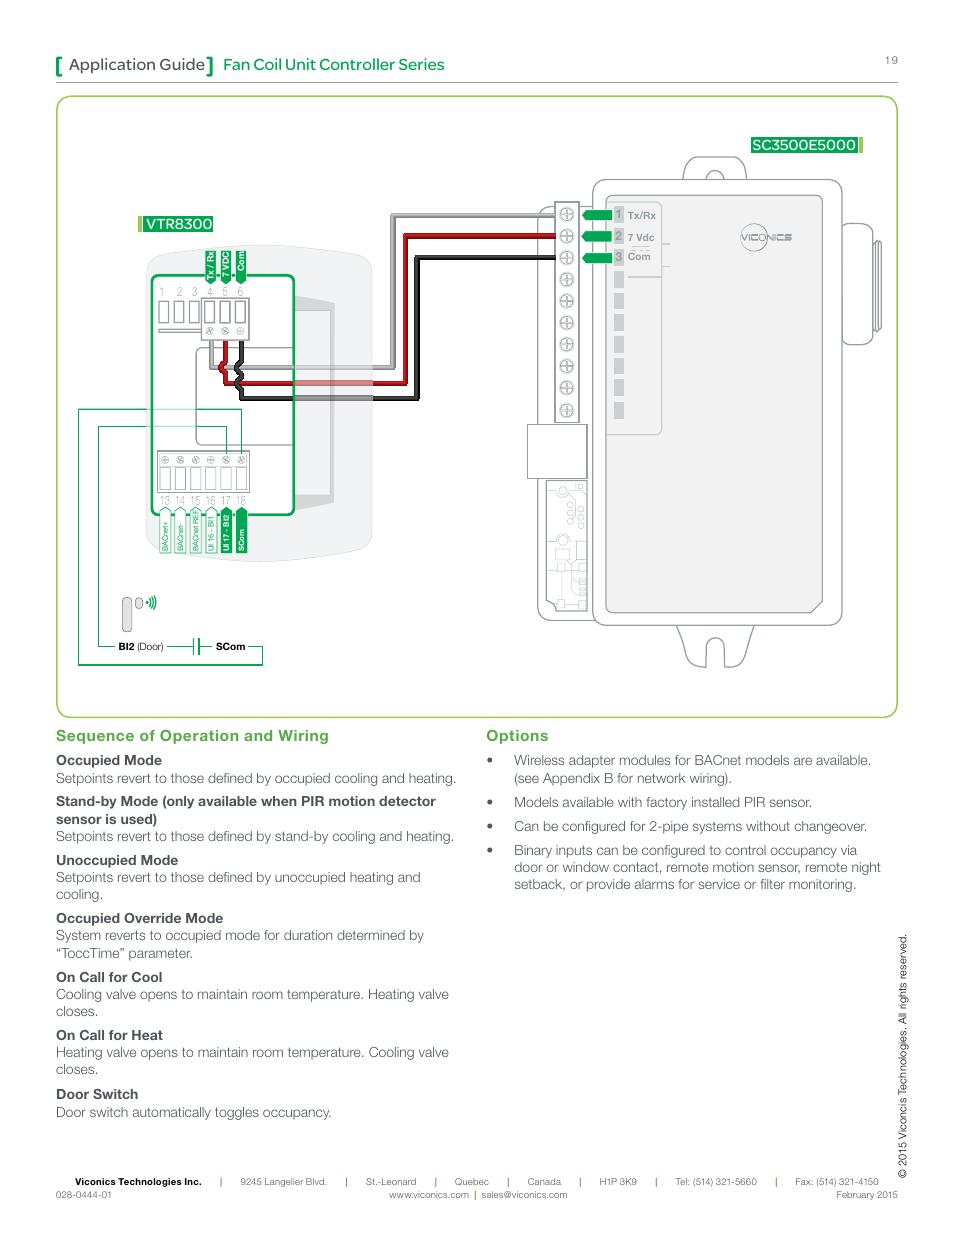 Votage Bacnet Wiring | Wiring Liry on x10 wiring, bms wiring, dali wiring, insteon wiring, canopen wiring, ethernet wiring, mstp wiring, profinet wiring, rs-232 wiring,